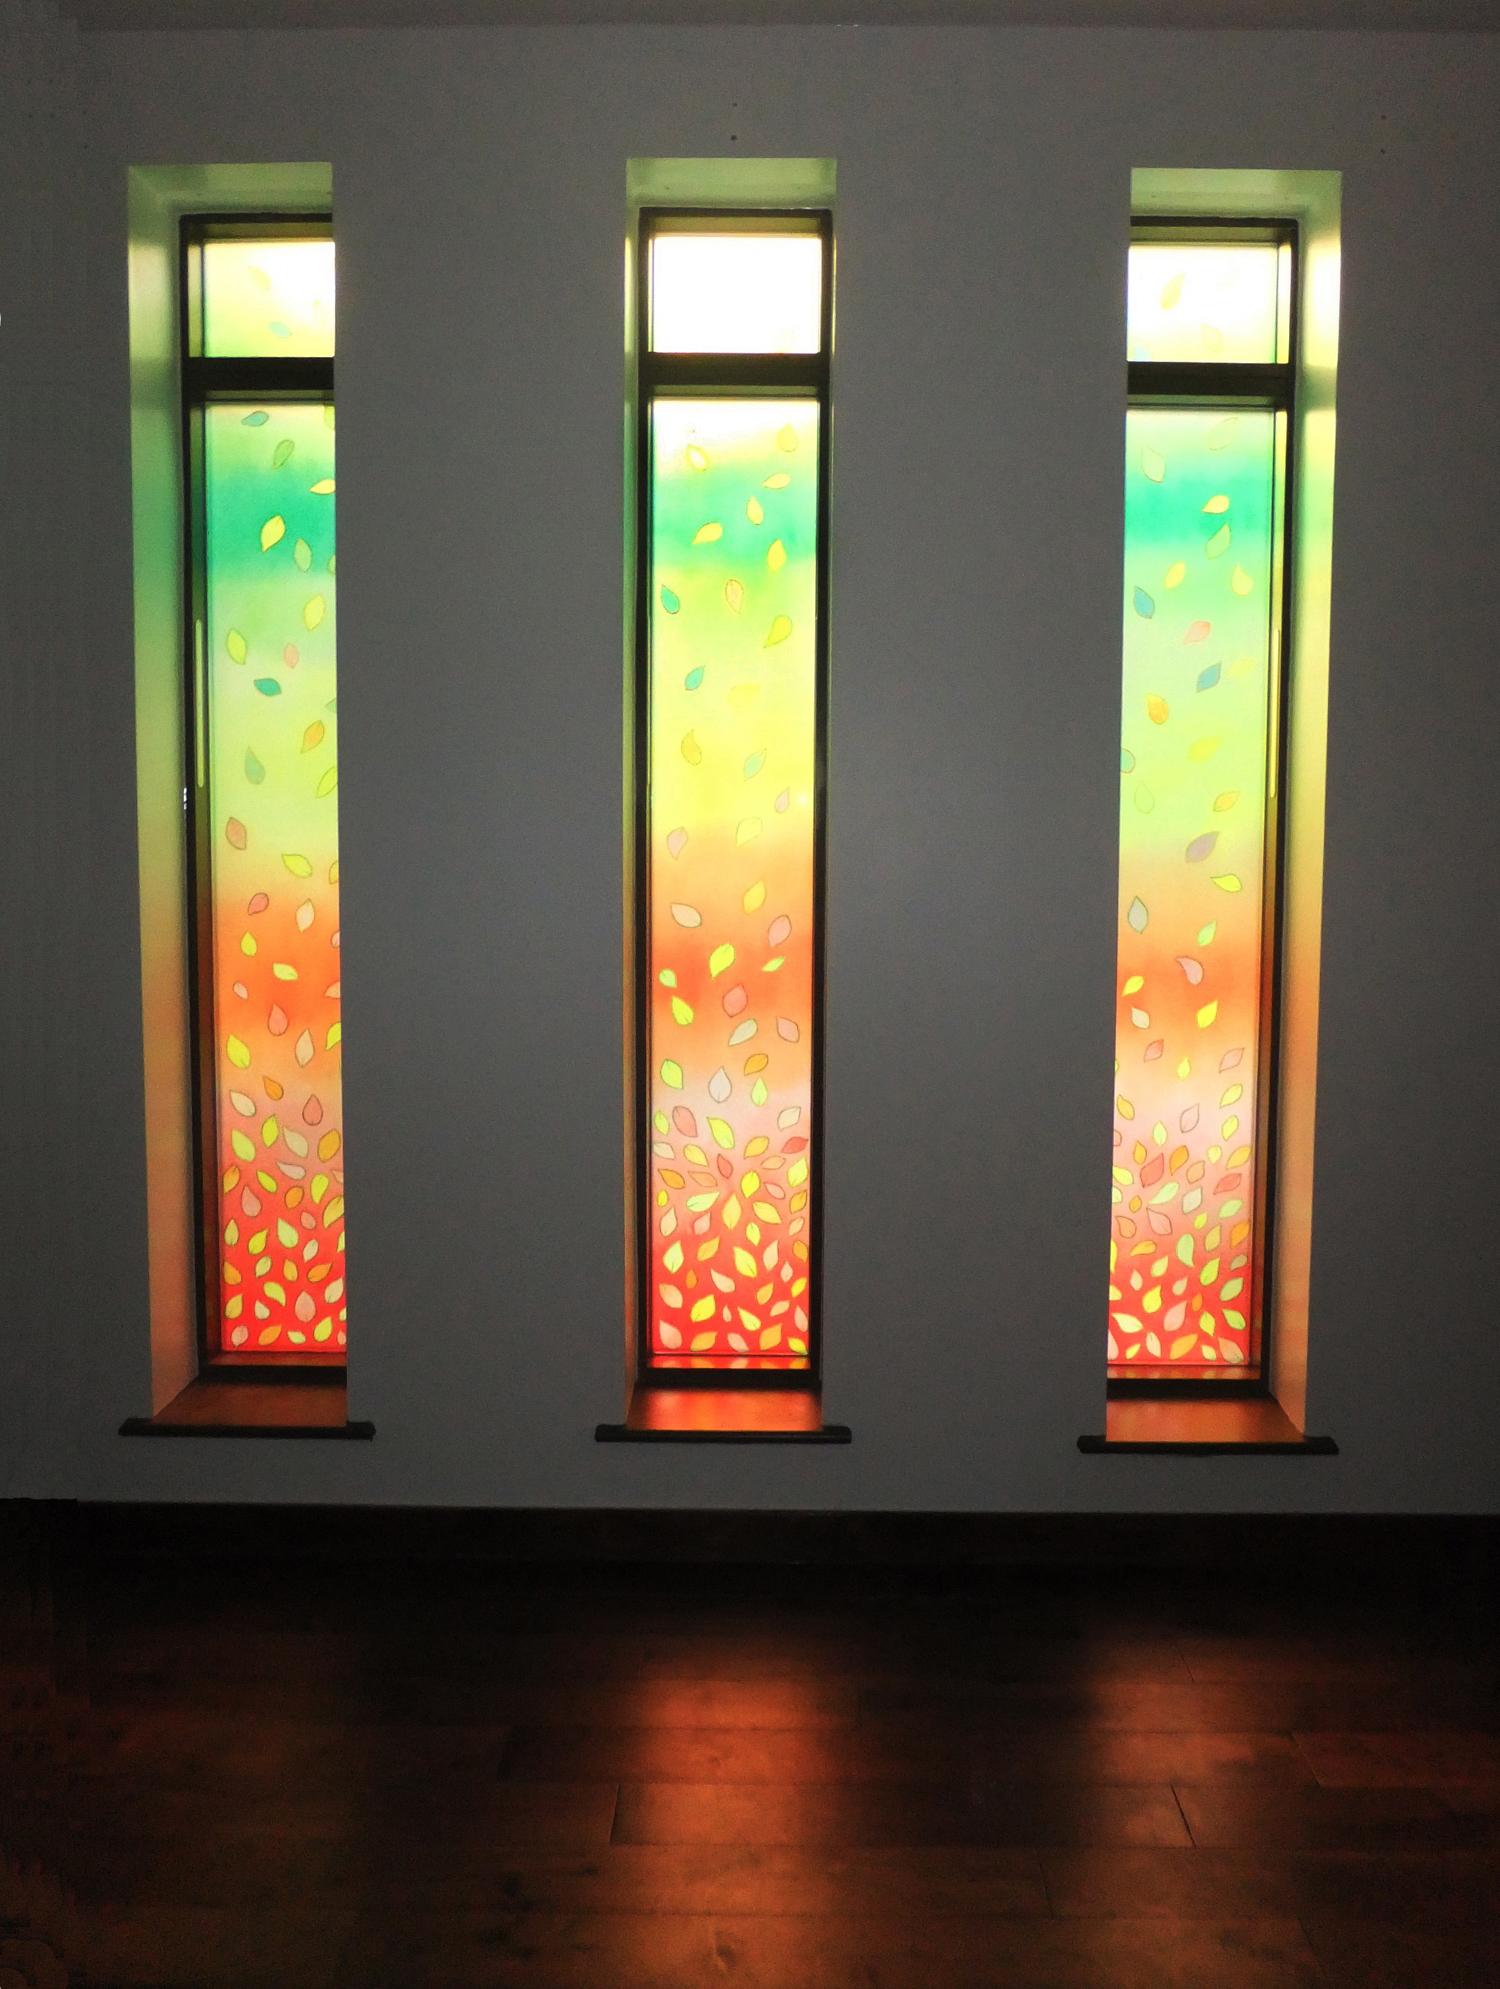 'Golden Green' Windows in Quiet Room, Marie Curie West Midlands Hopsice, Solihull.